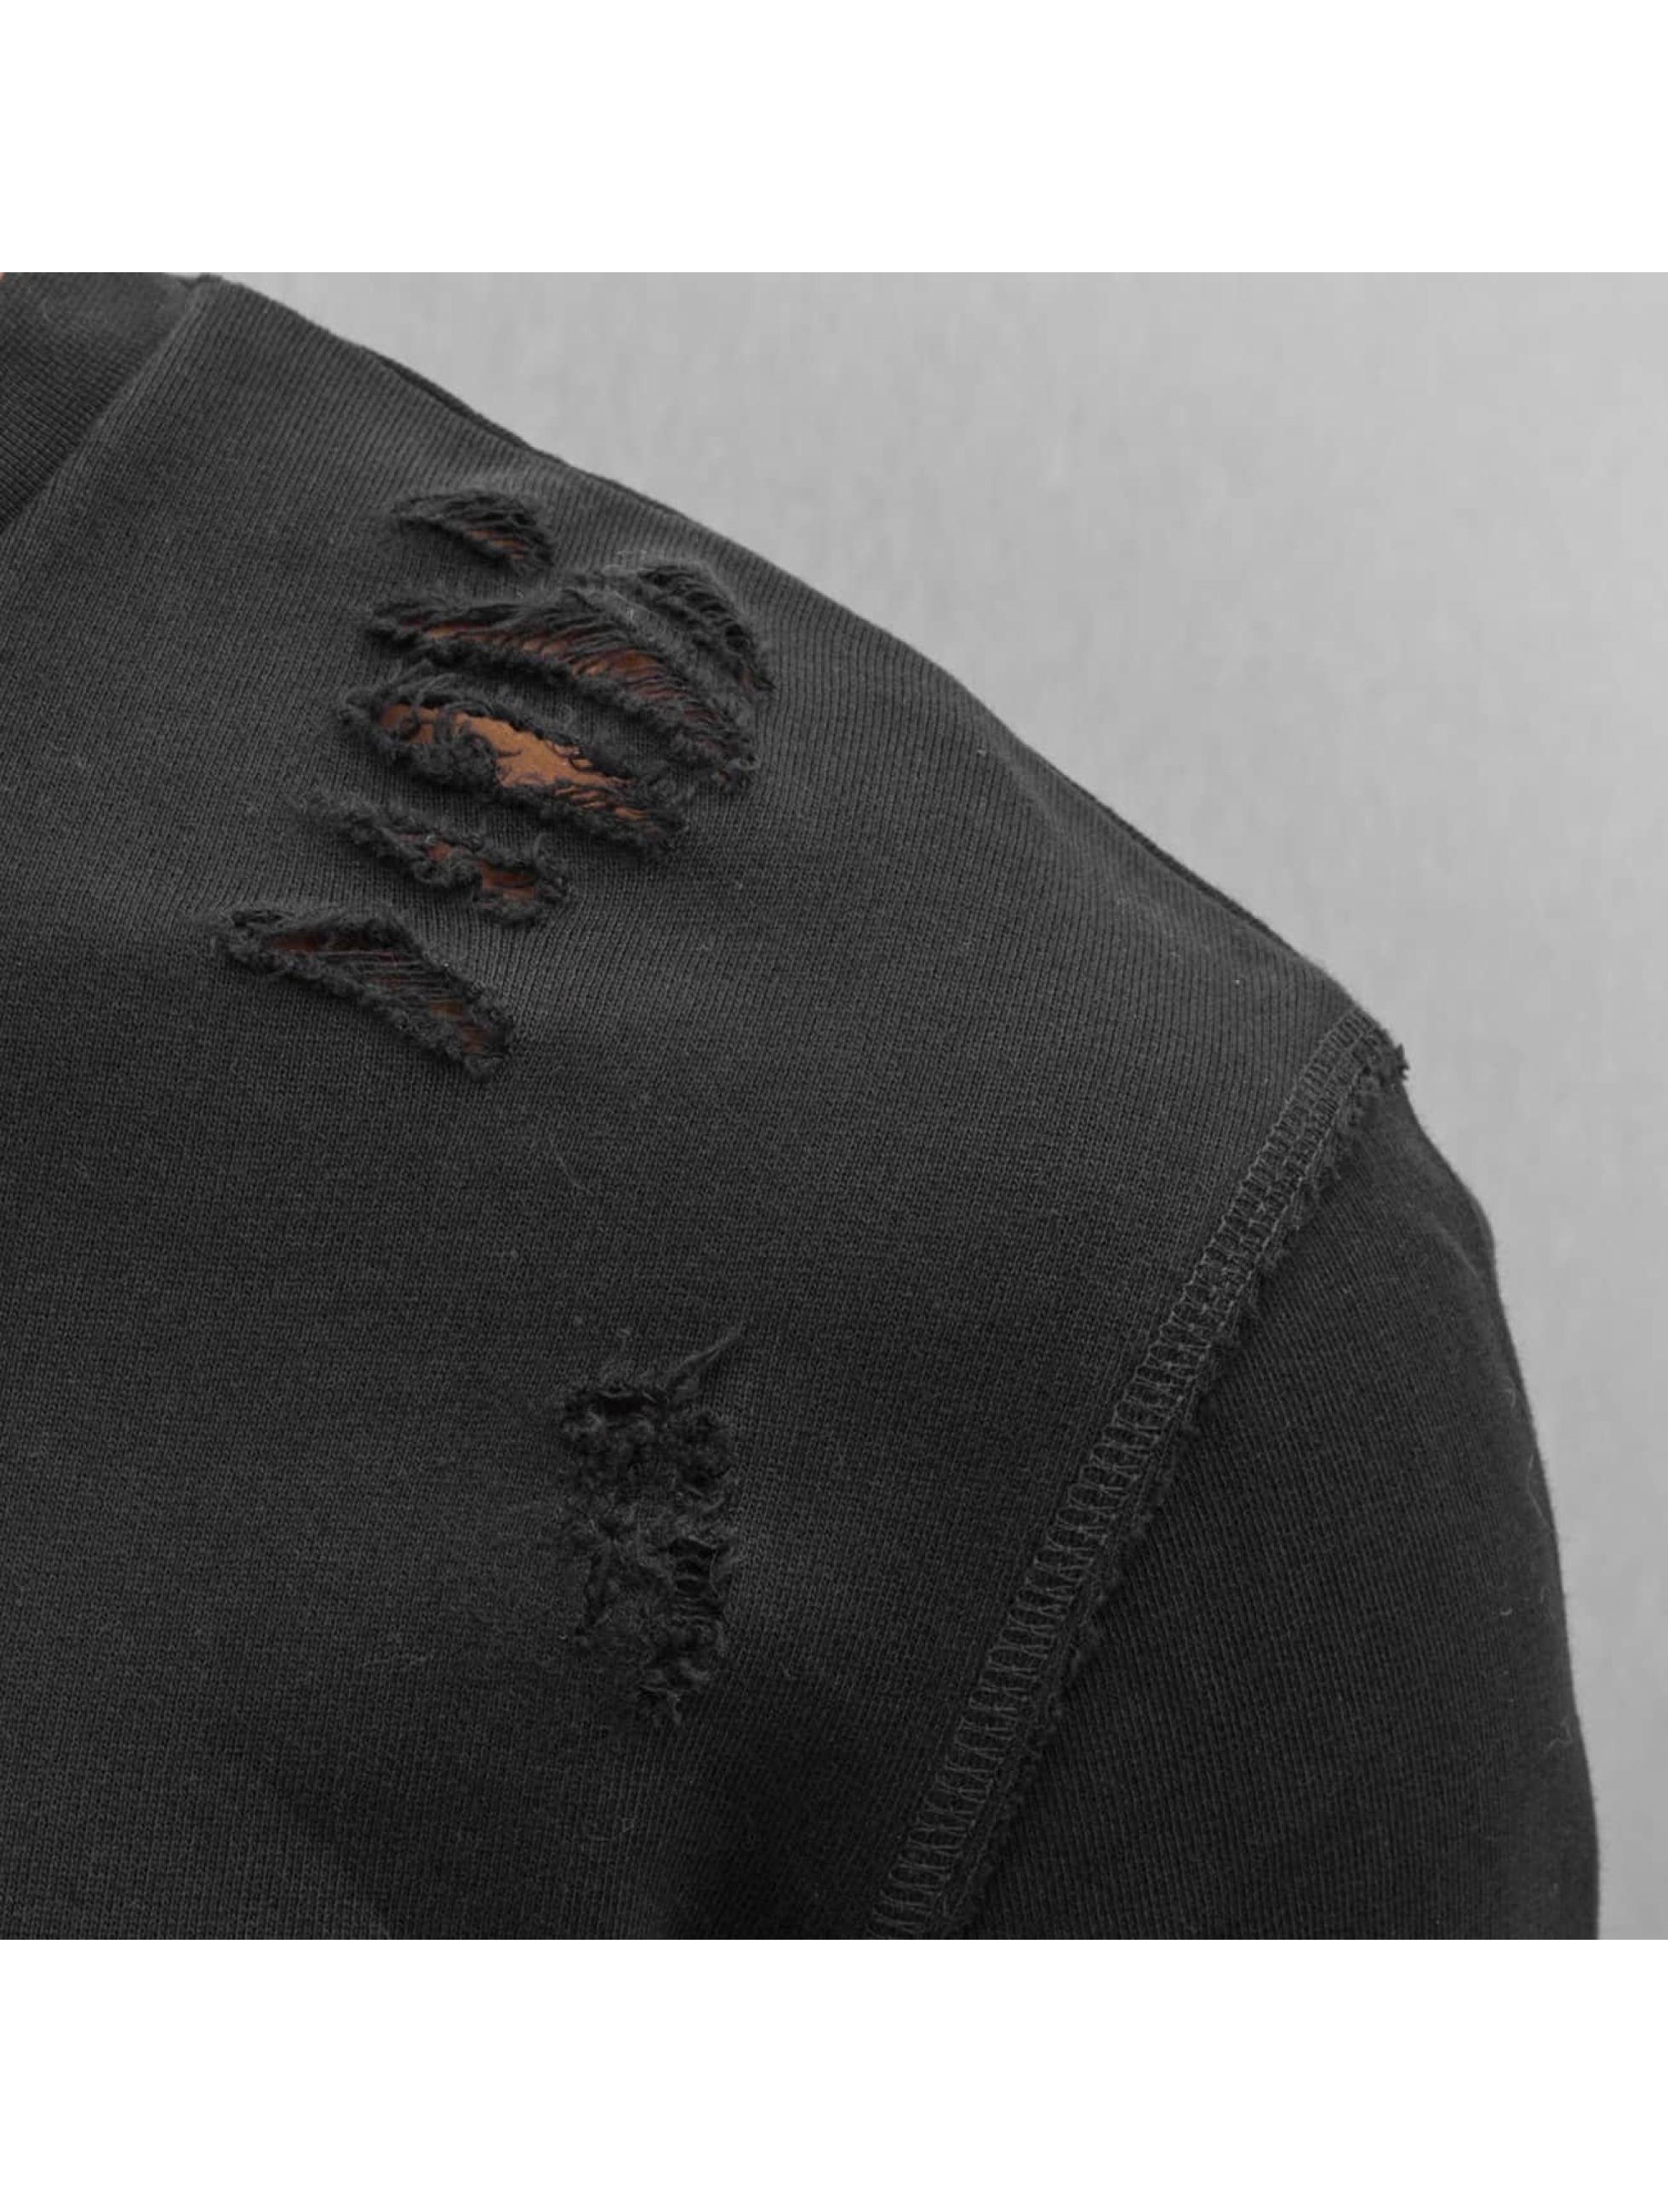 DEF Swetry Chaos czarny